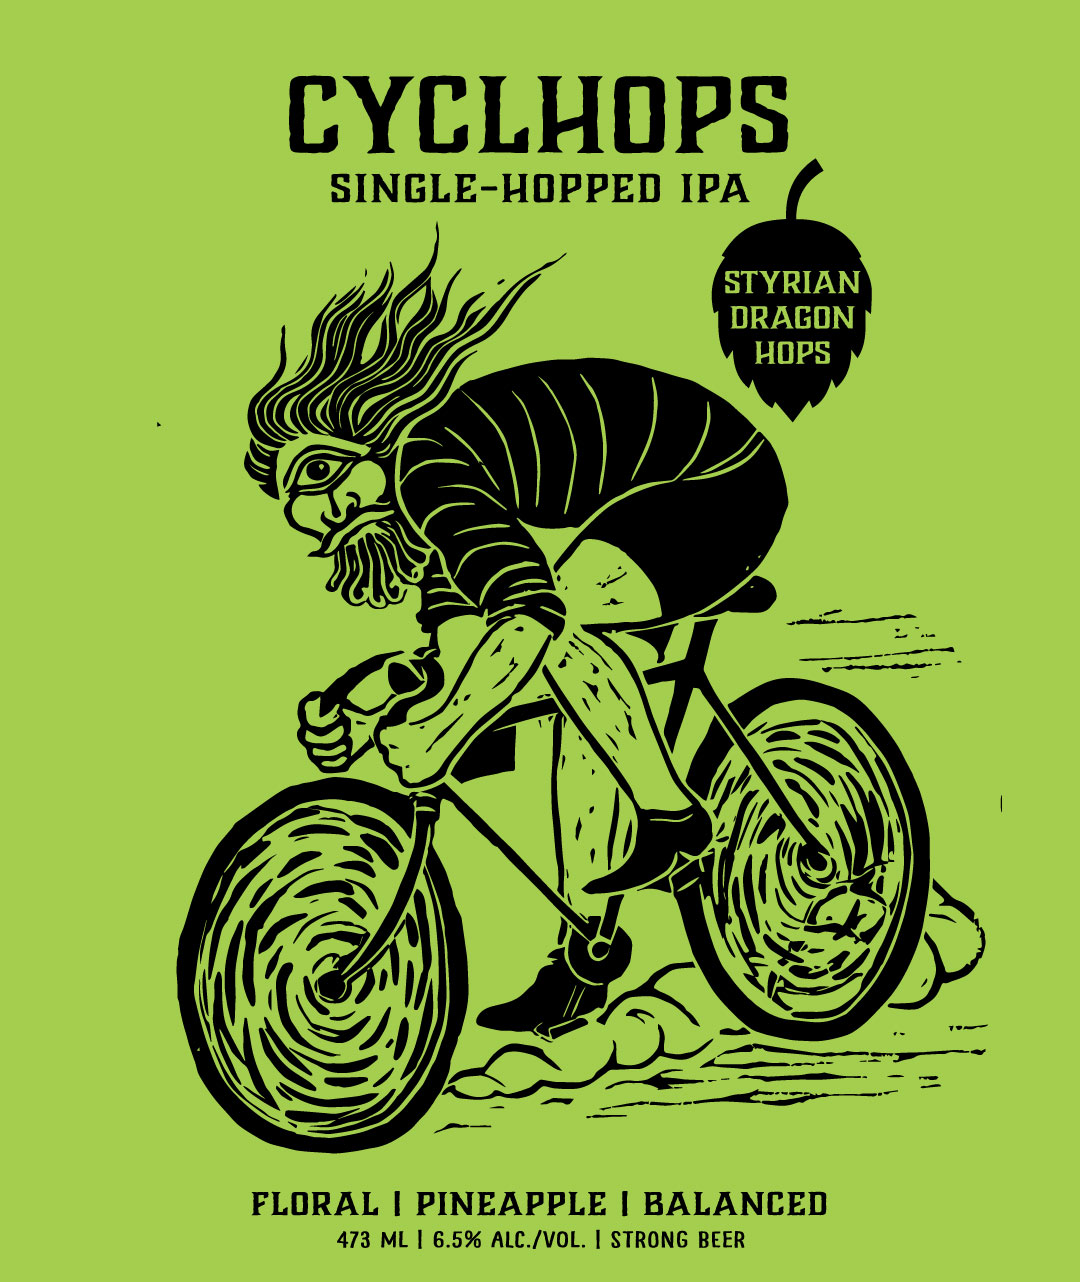 CYCLHOPS (STRYIAN DRAGON)